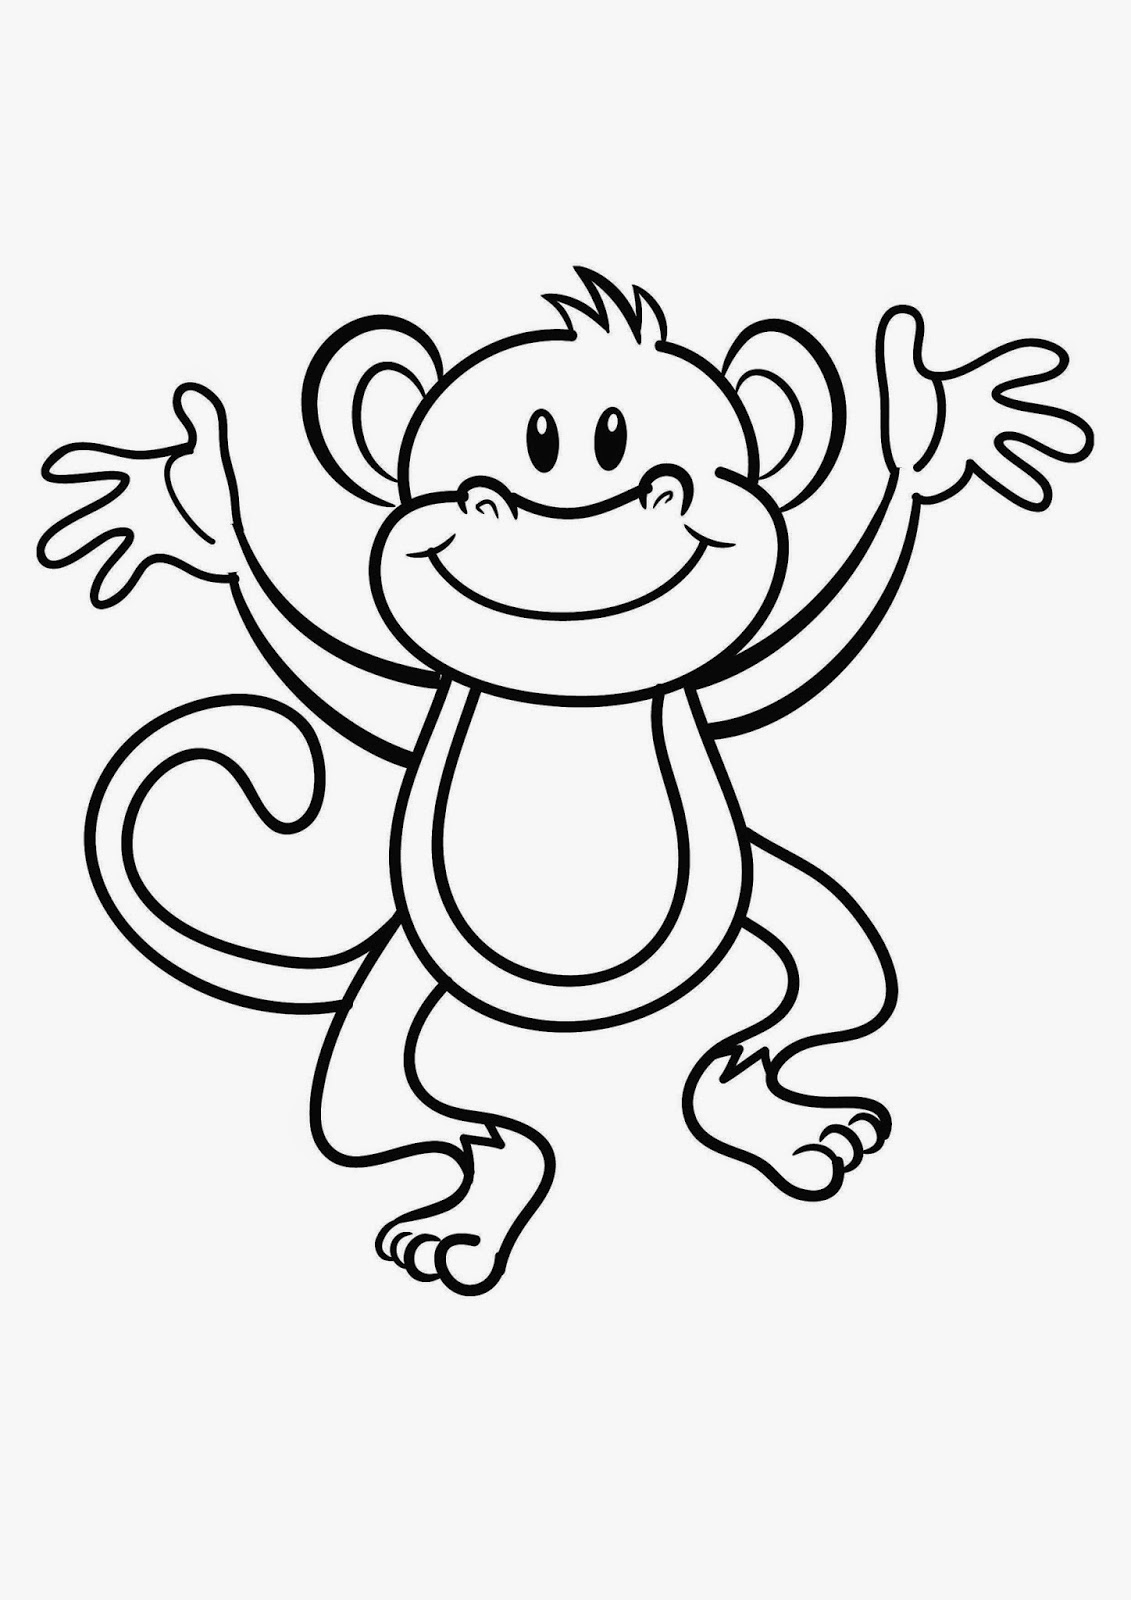 Dibujos para colorear dibujos de monos - Dibujos de pared ...